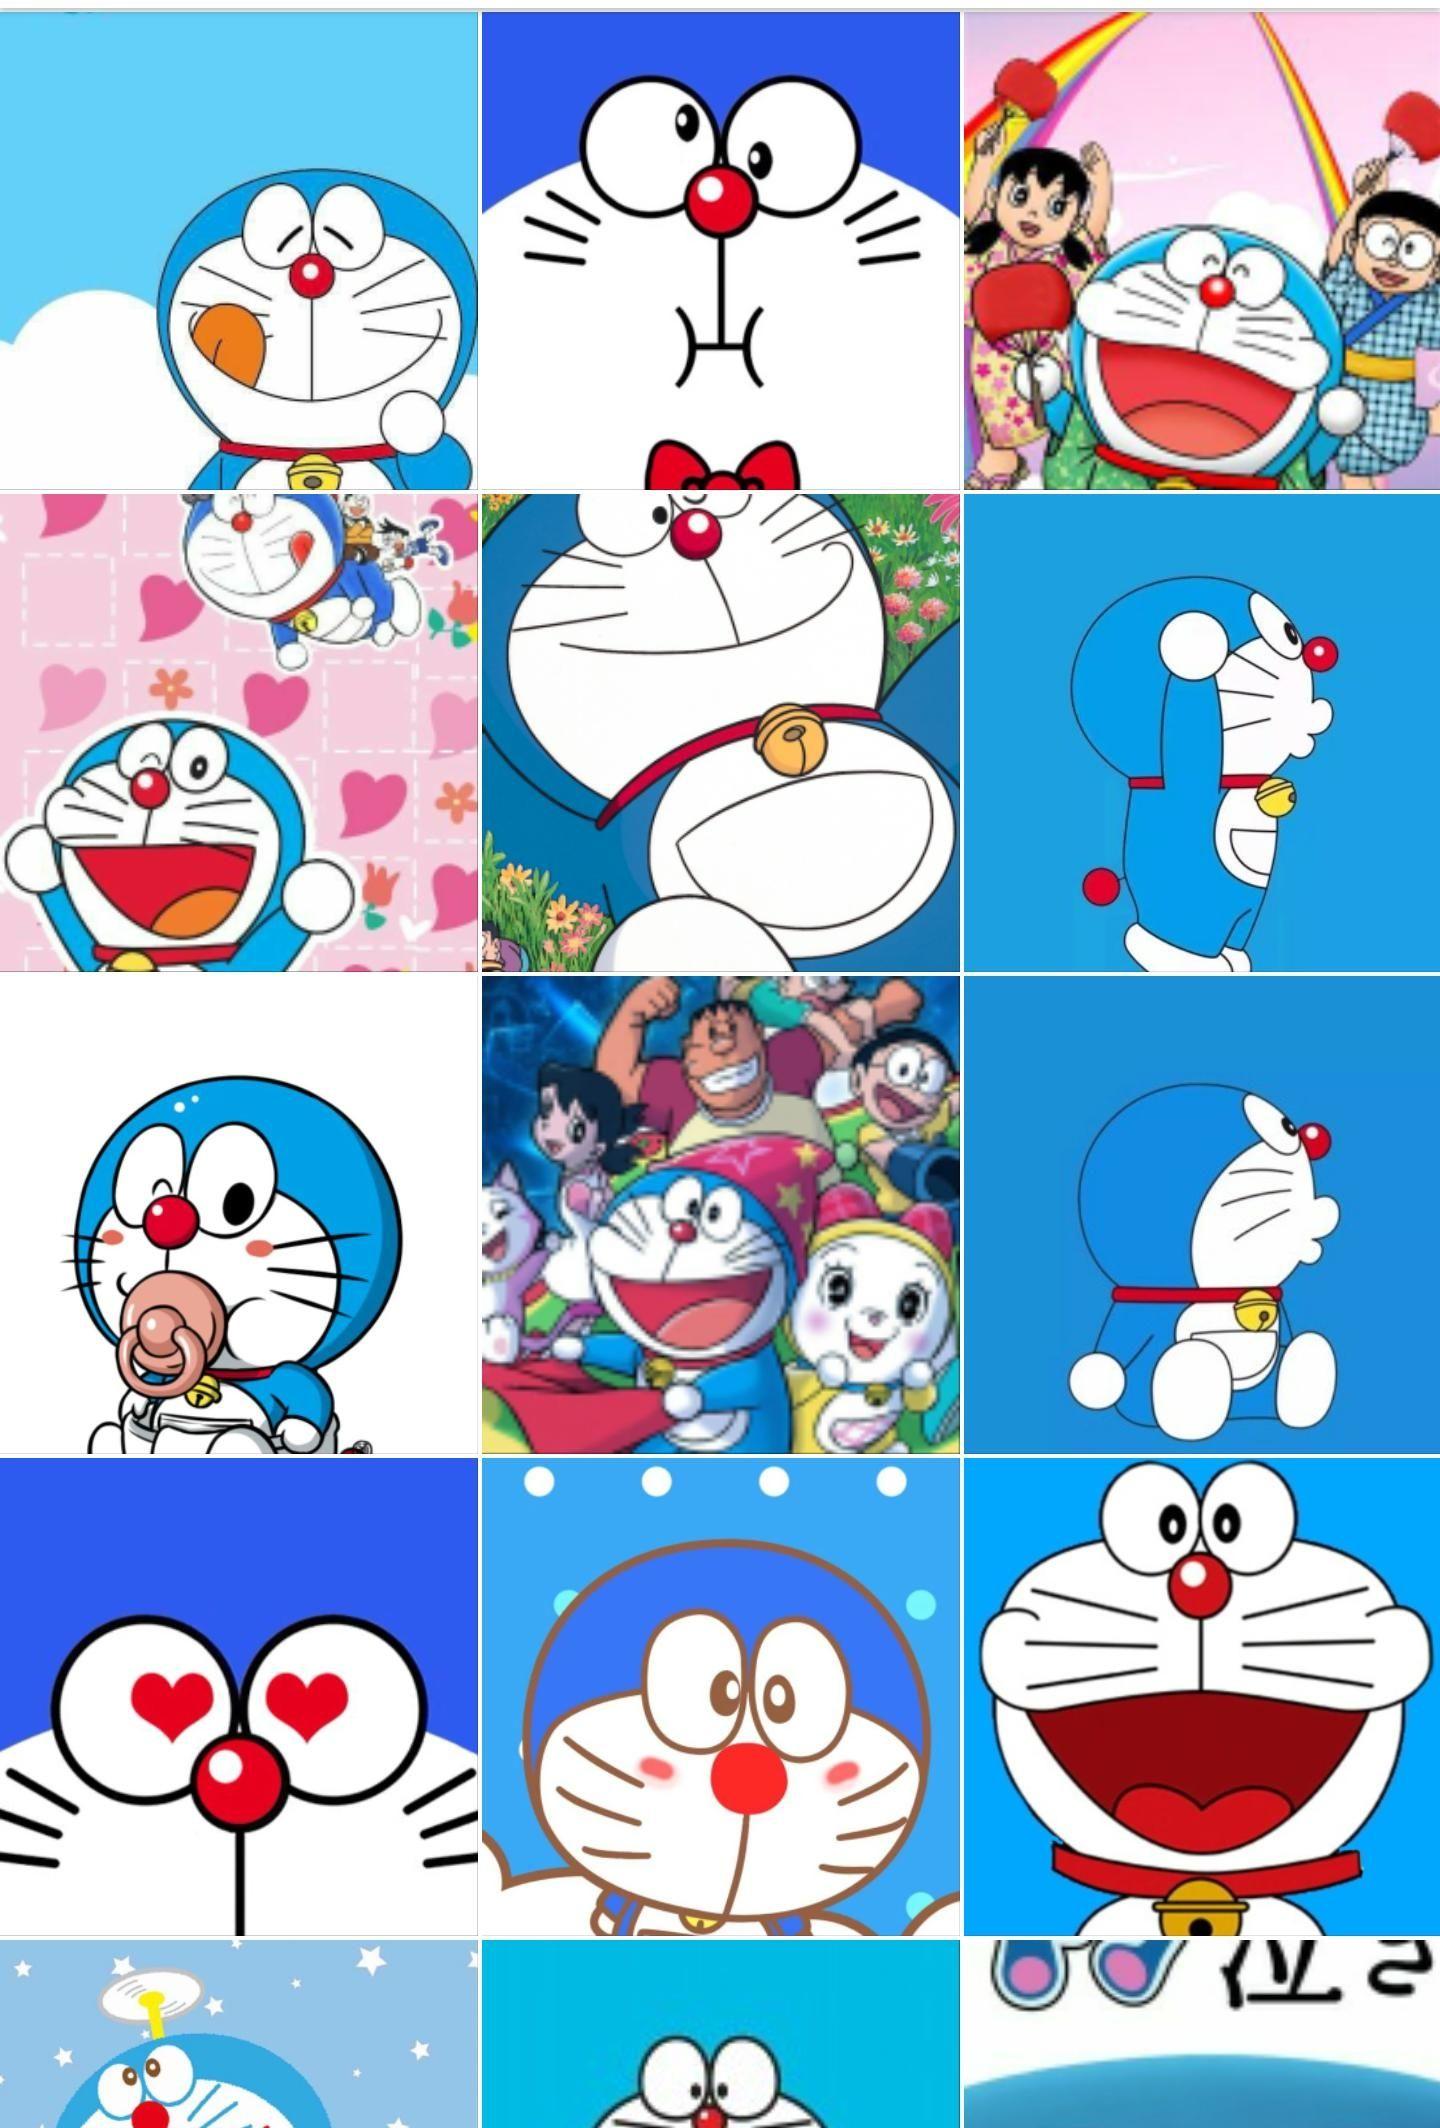 Doraemon Wallpaper 134 Offline For Android Apk Download Pertaining To Wallpapers Gambar Doraemon Doraemon Wallpapers Cute Cartoon Wallpapers Cartoon Wallpaper Anime wallpaper hd offline